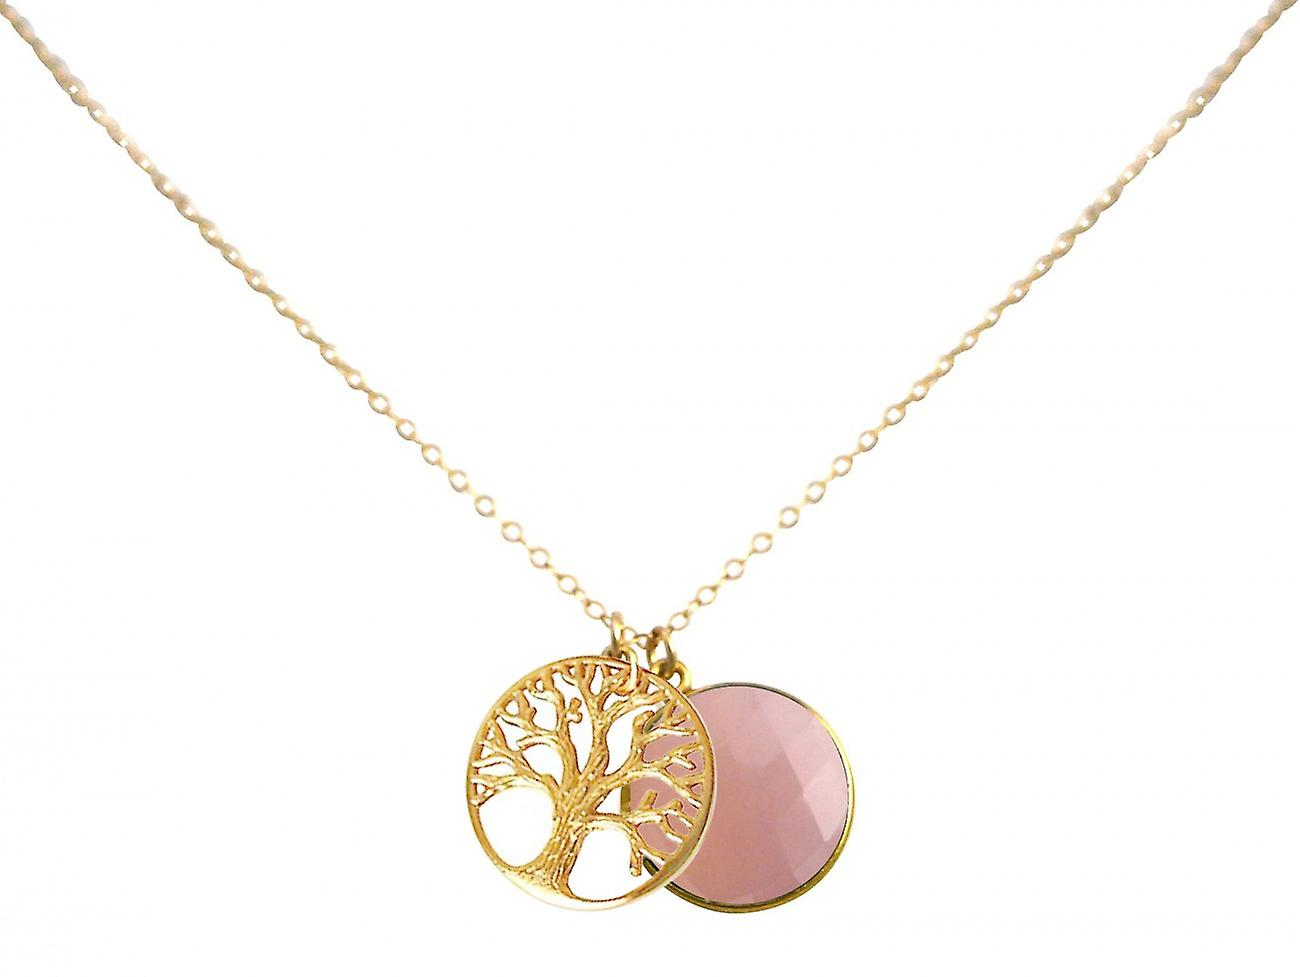 Gemshine - Damen - Halskette - Anhänger - LEBENSBAUM - 925 Silber Vergoldet - Onyx - Rosa - 45 cm